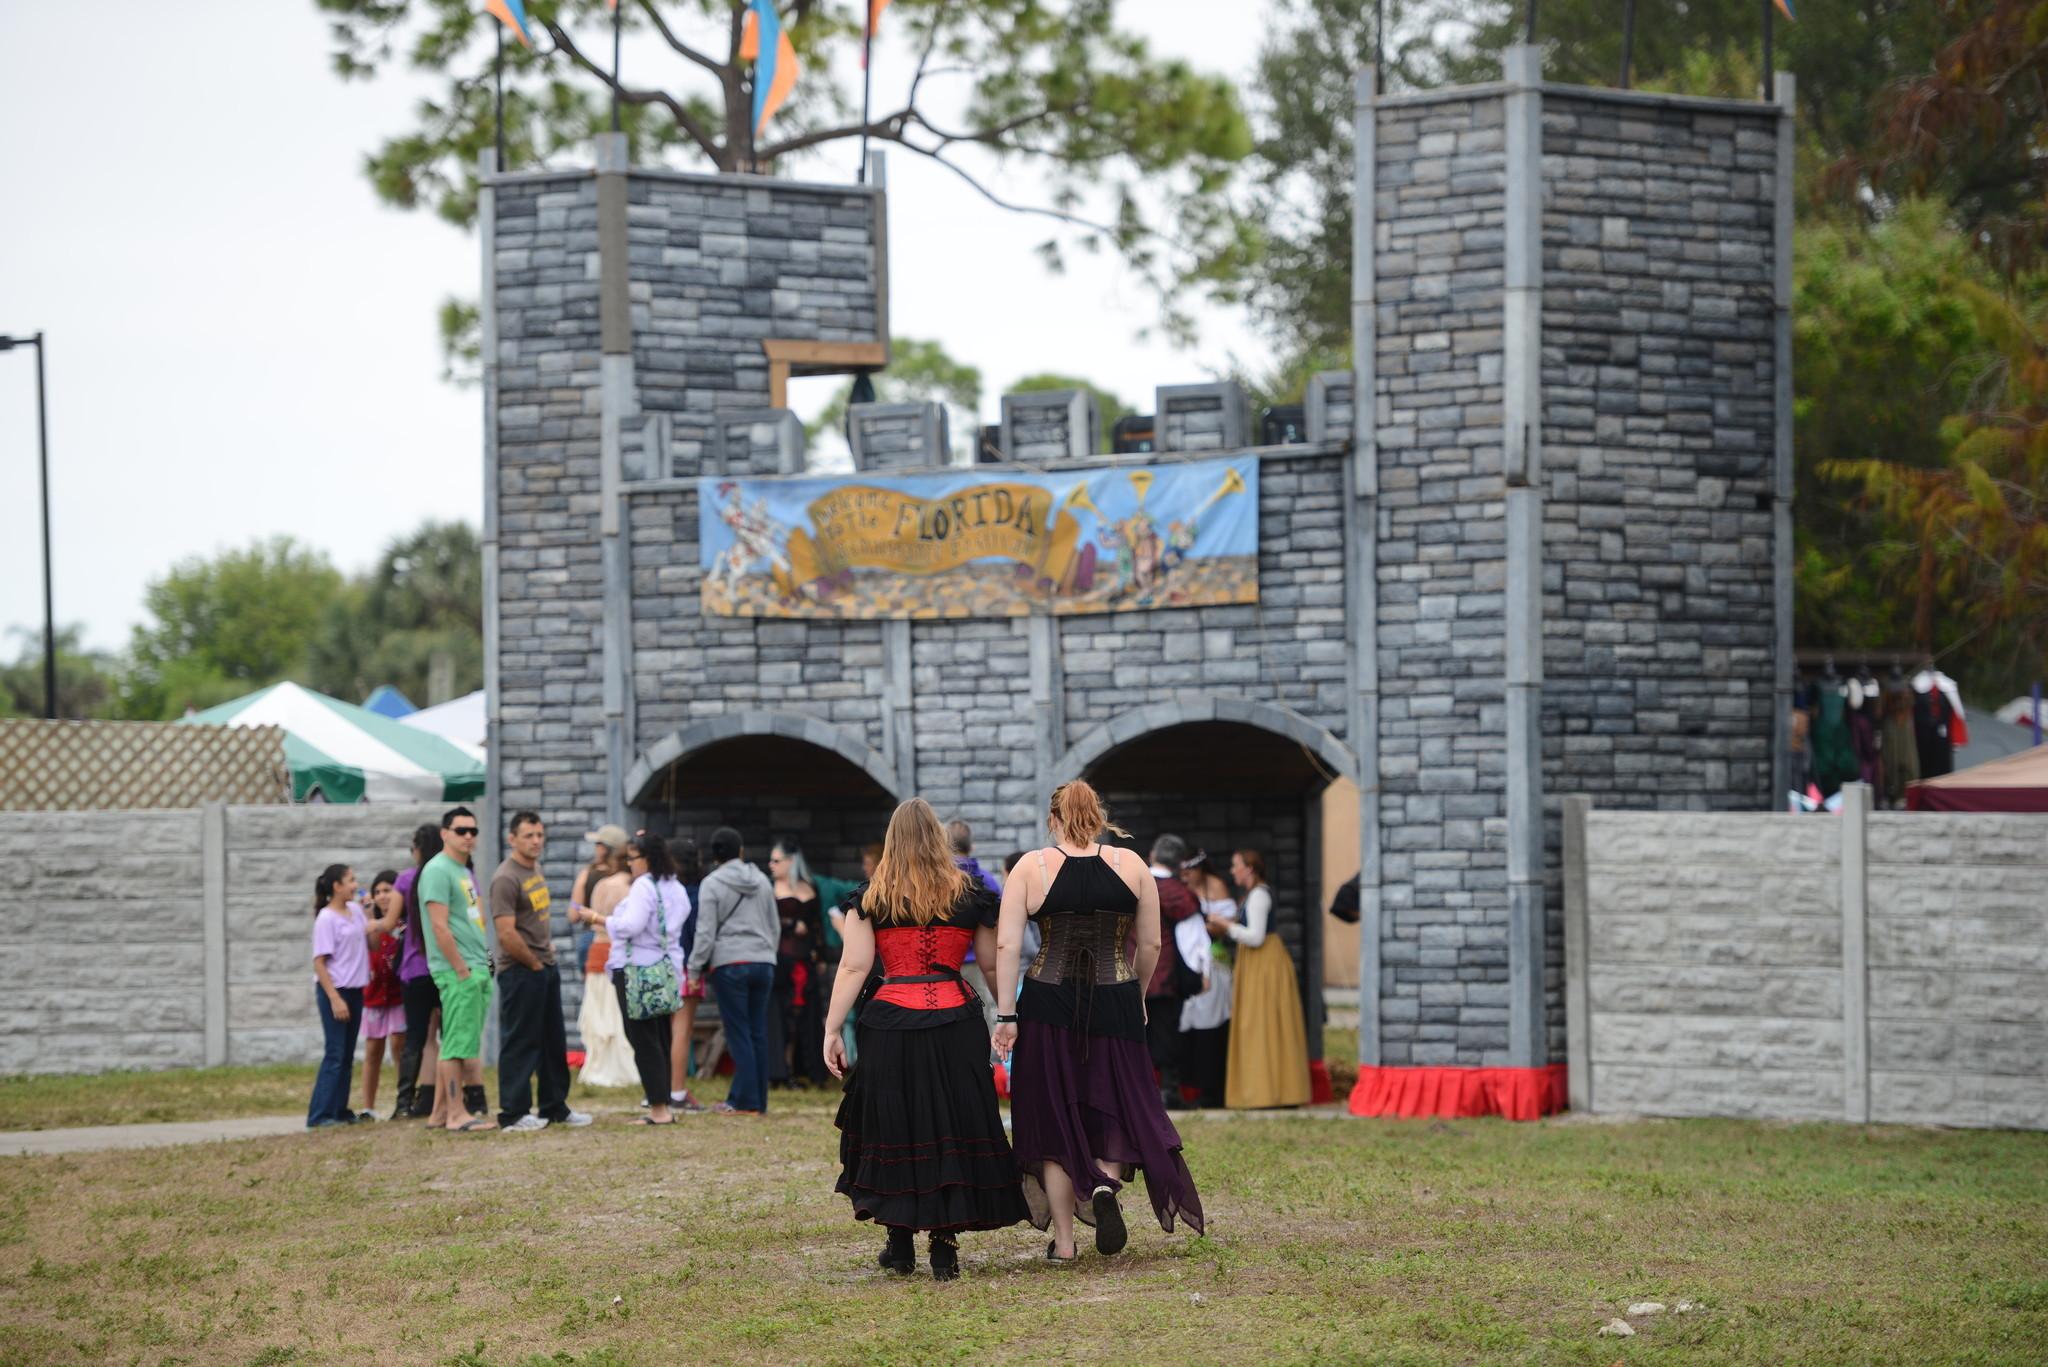 Renaissance Festival photos - Castle Wall